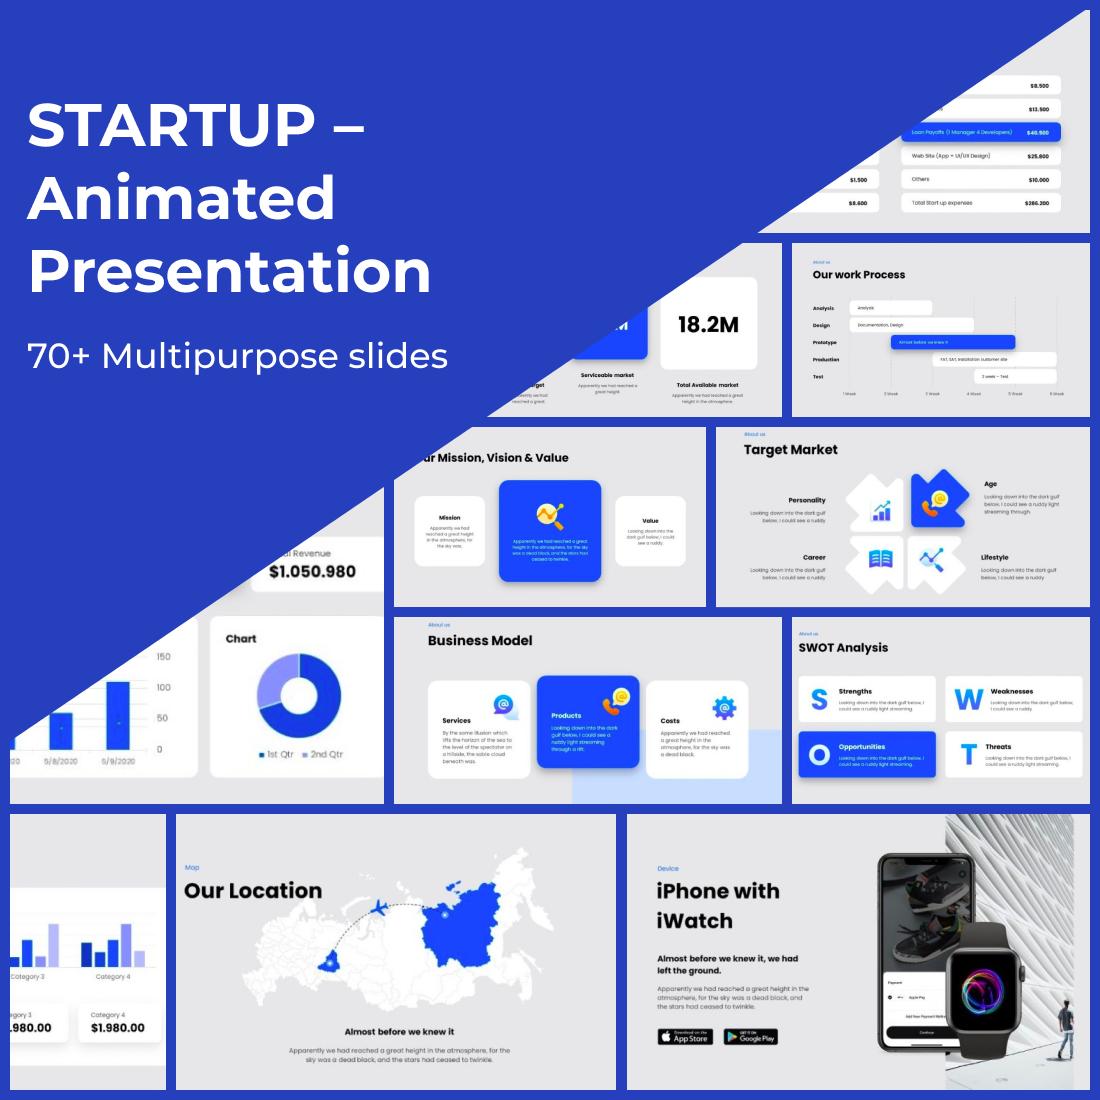 3 STARTUP – Animated Presentation